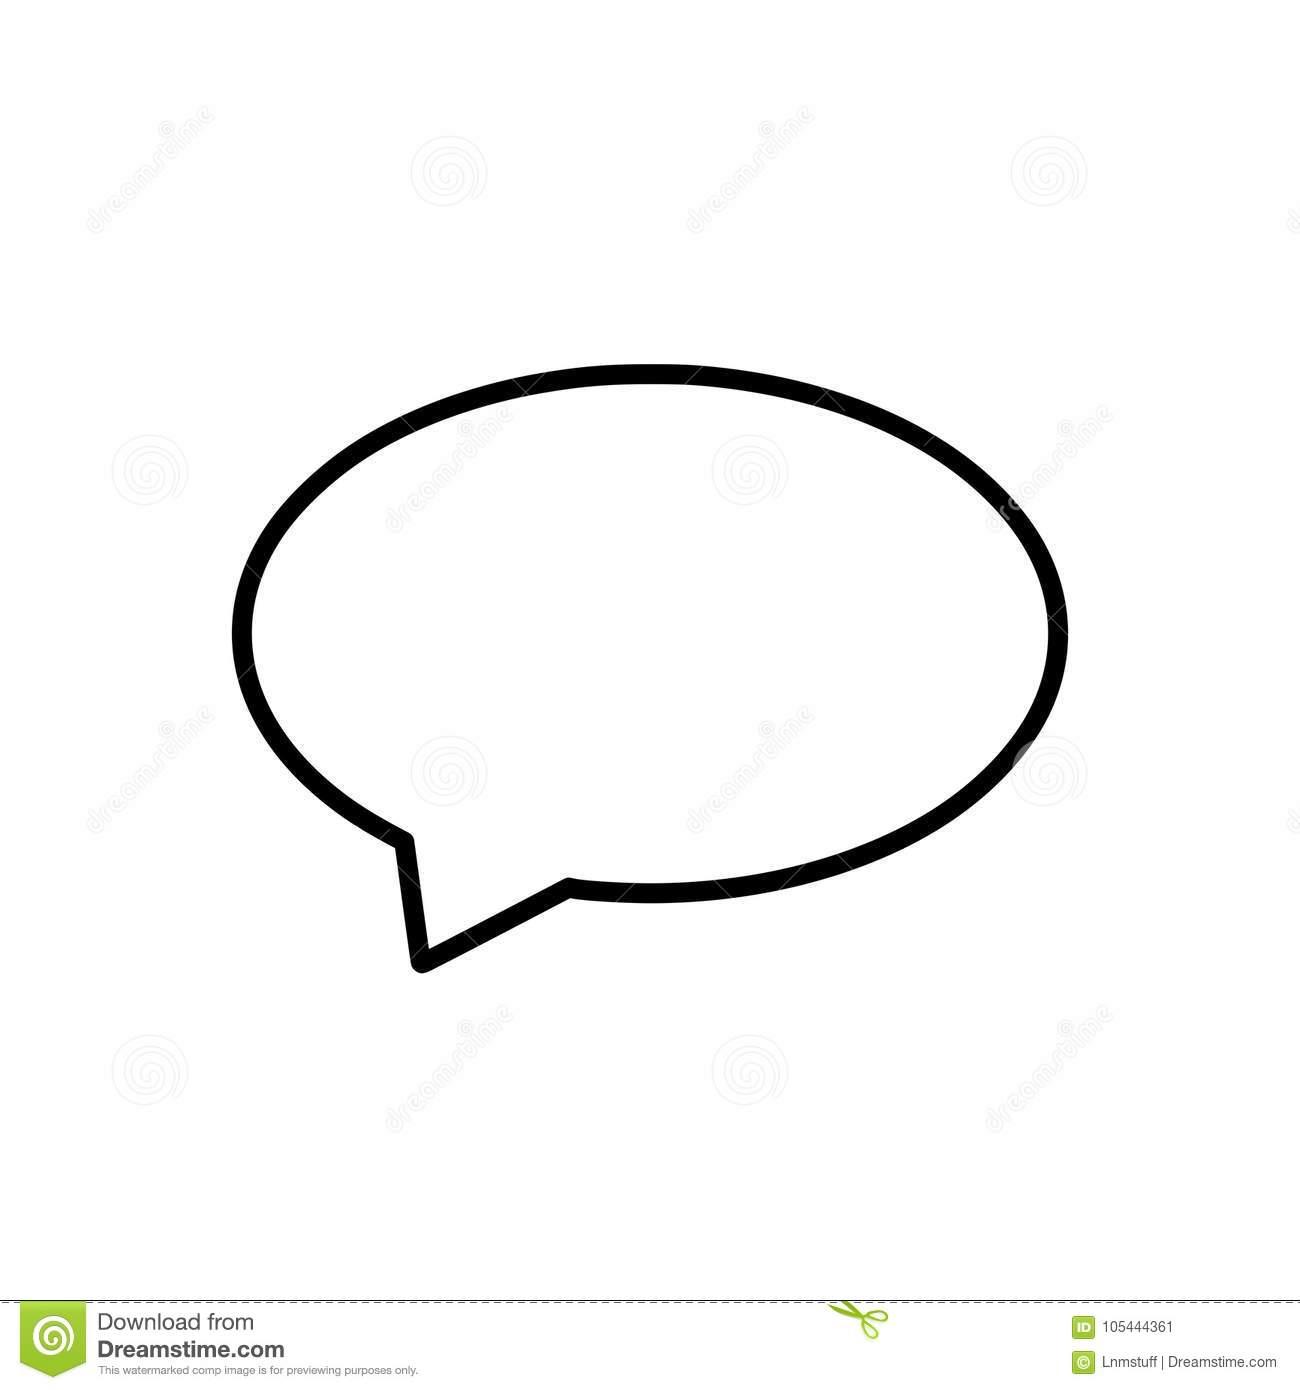 Dialog callout shape.